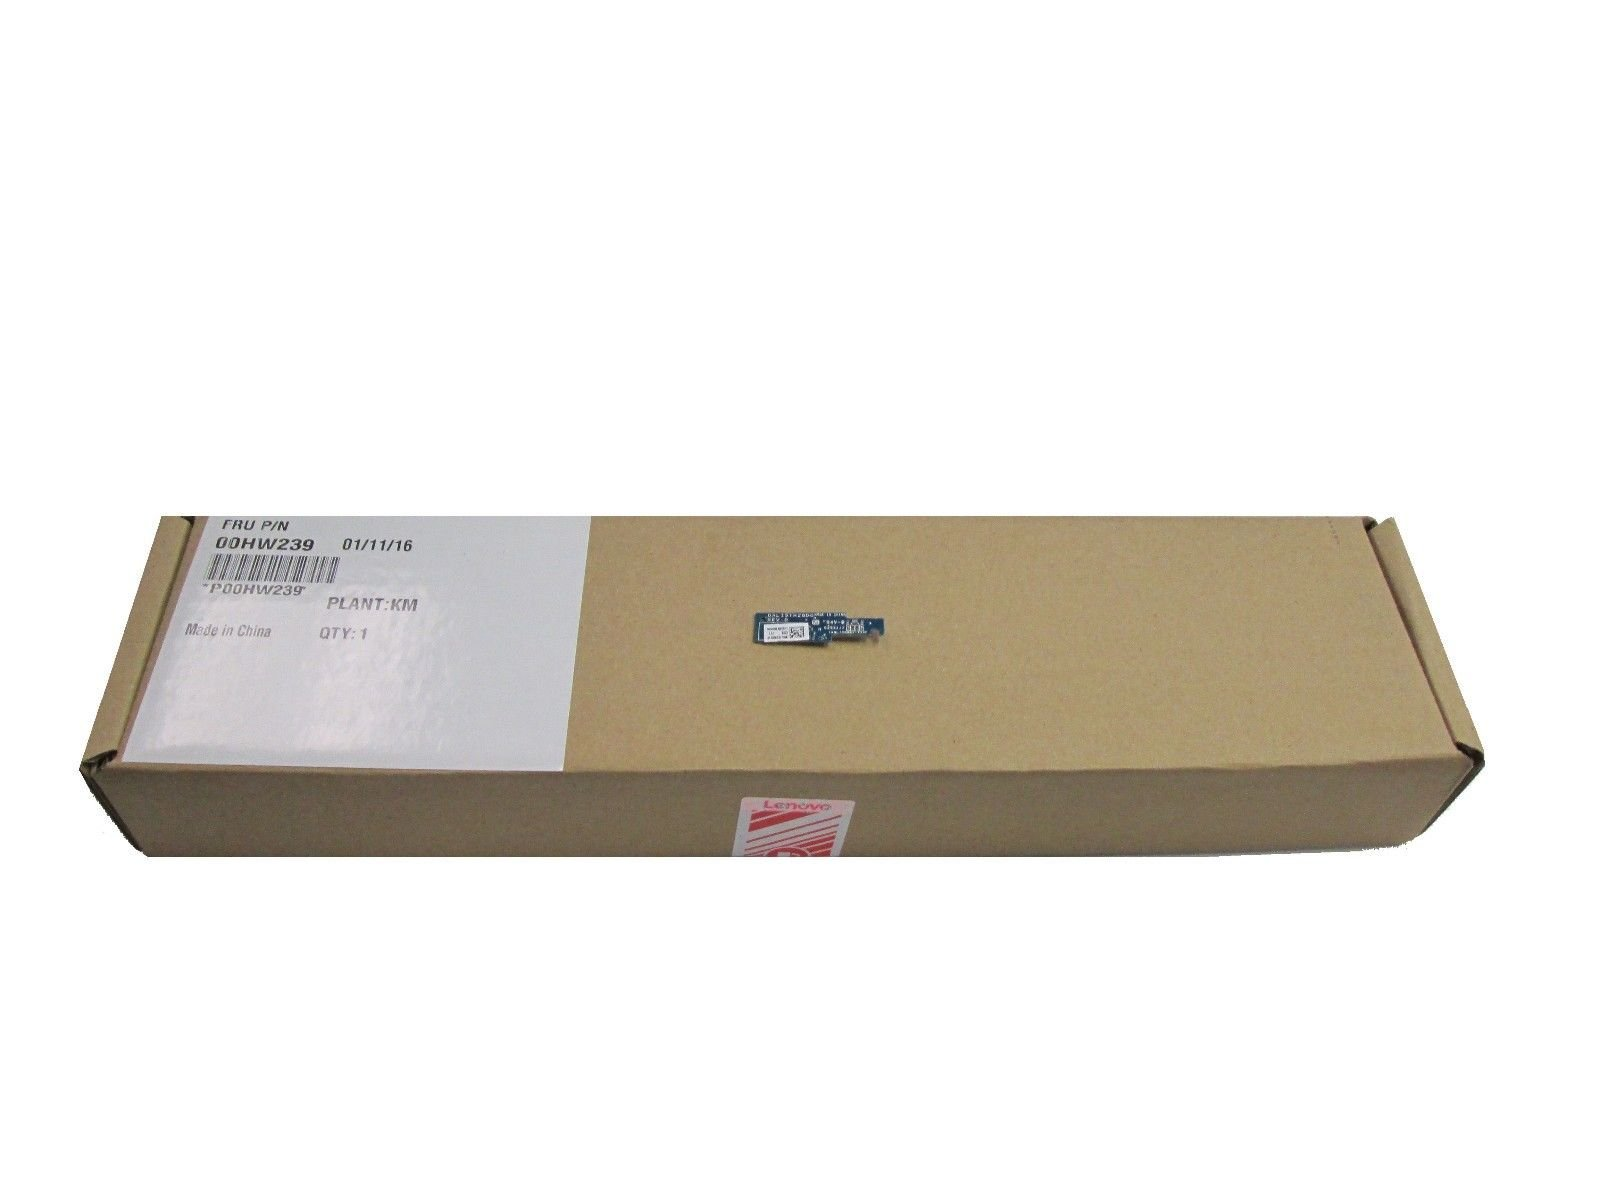 New Genuine Board For Lenovo ThinkPad Yoga 11E Chrombook Sensor Board 00HW239